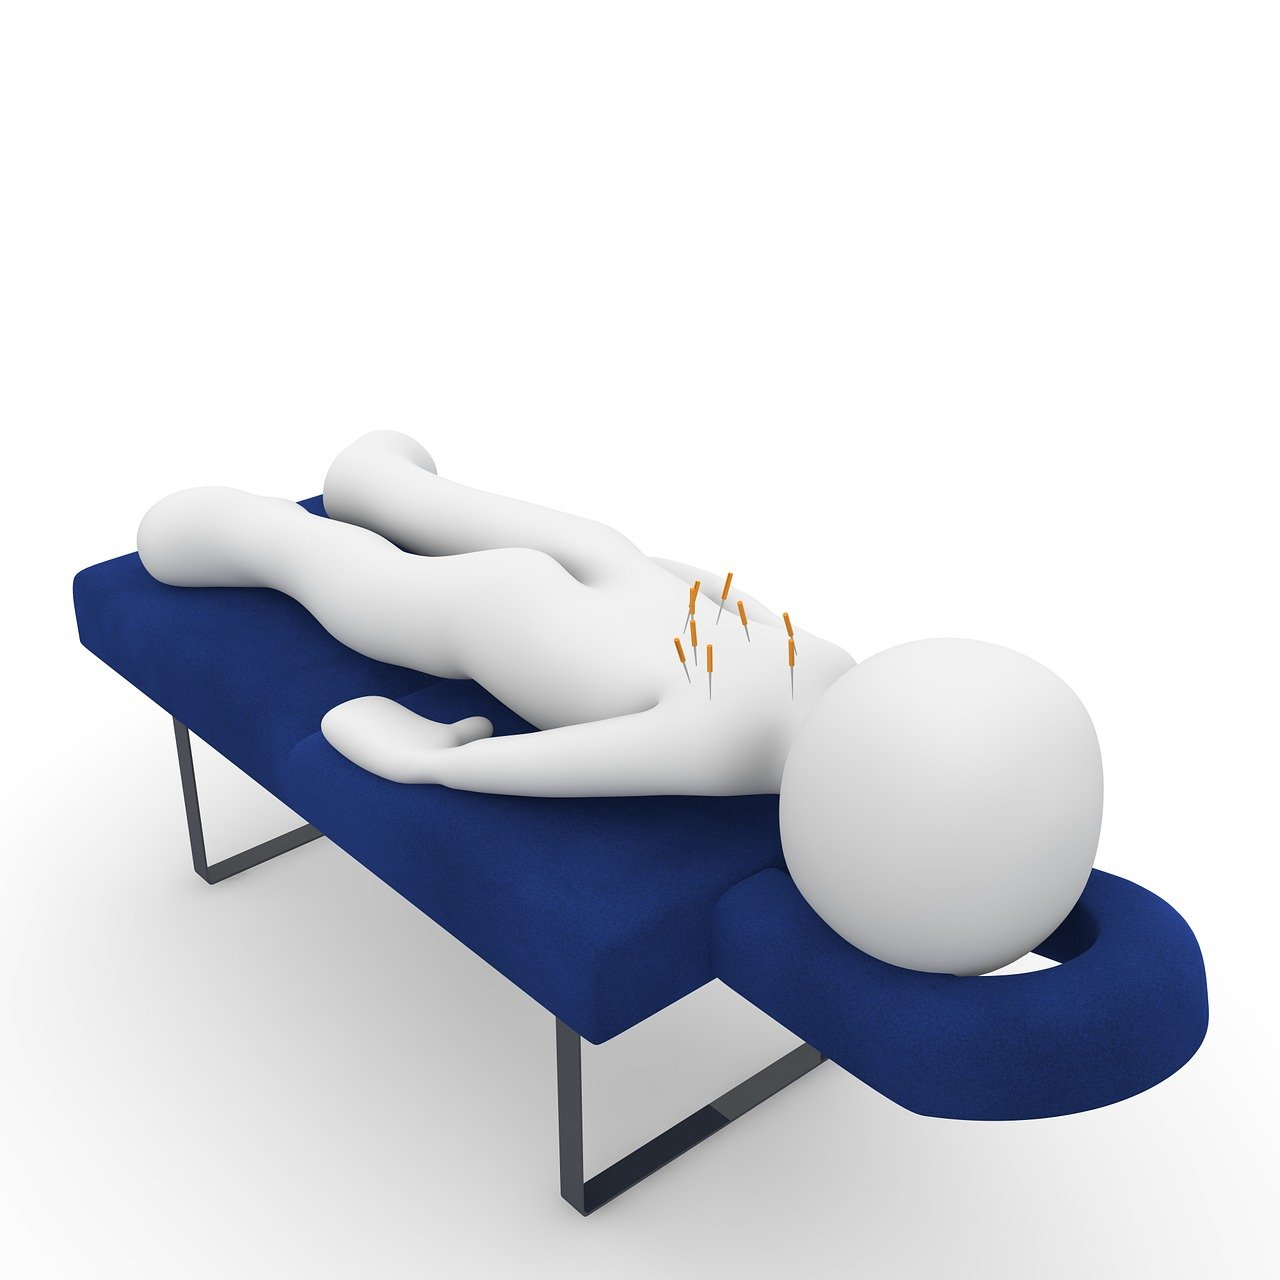 Medifit Groepspraktijk voor Fysio- Manuele Therapie en Acupunctuur fysiotherapie kosten